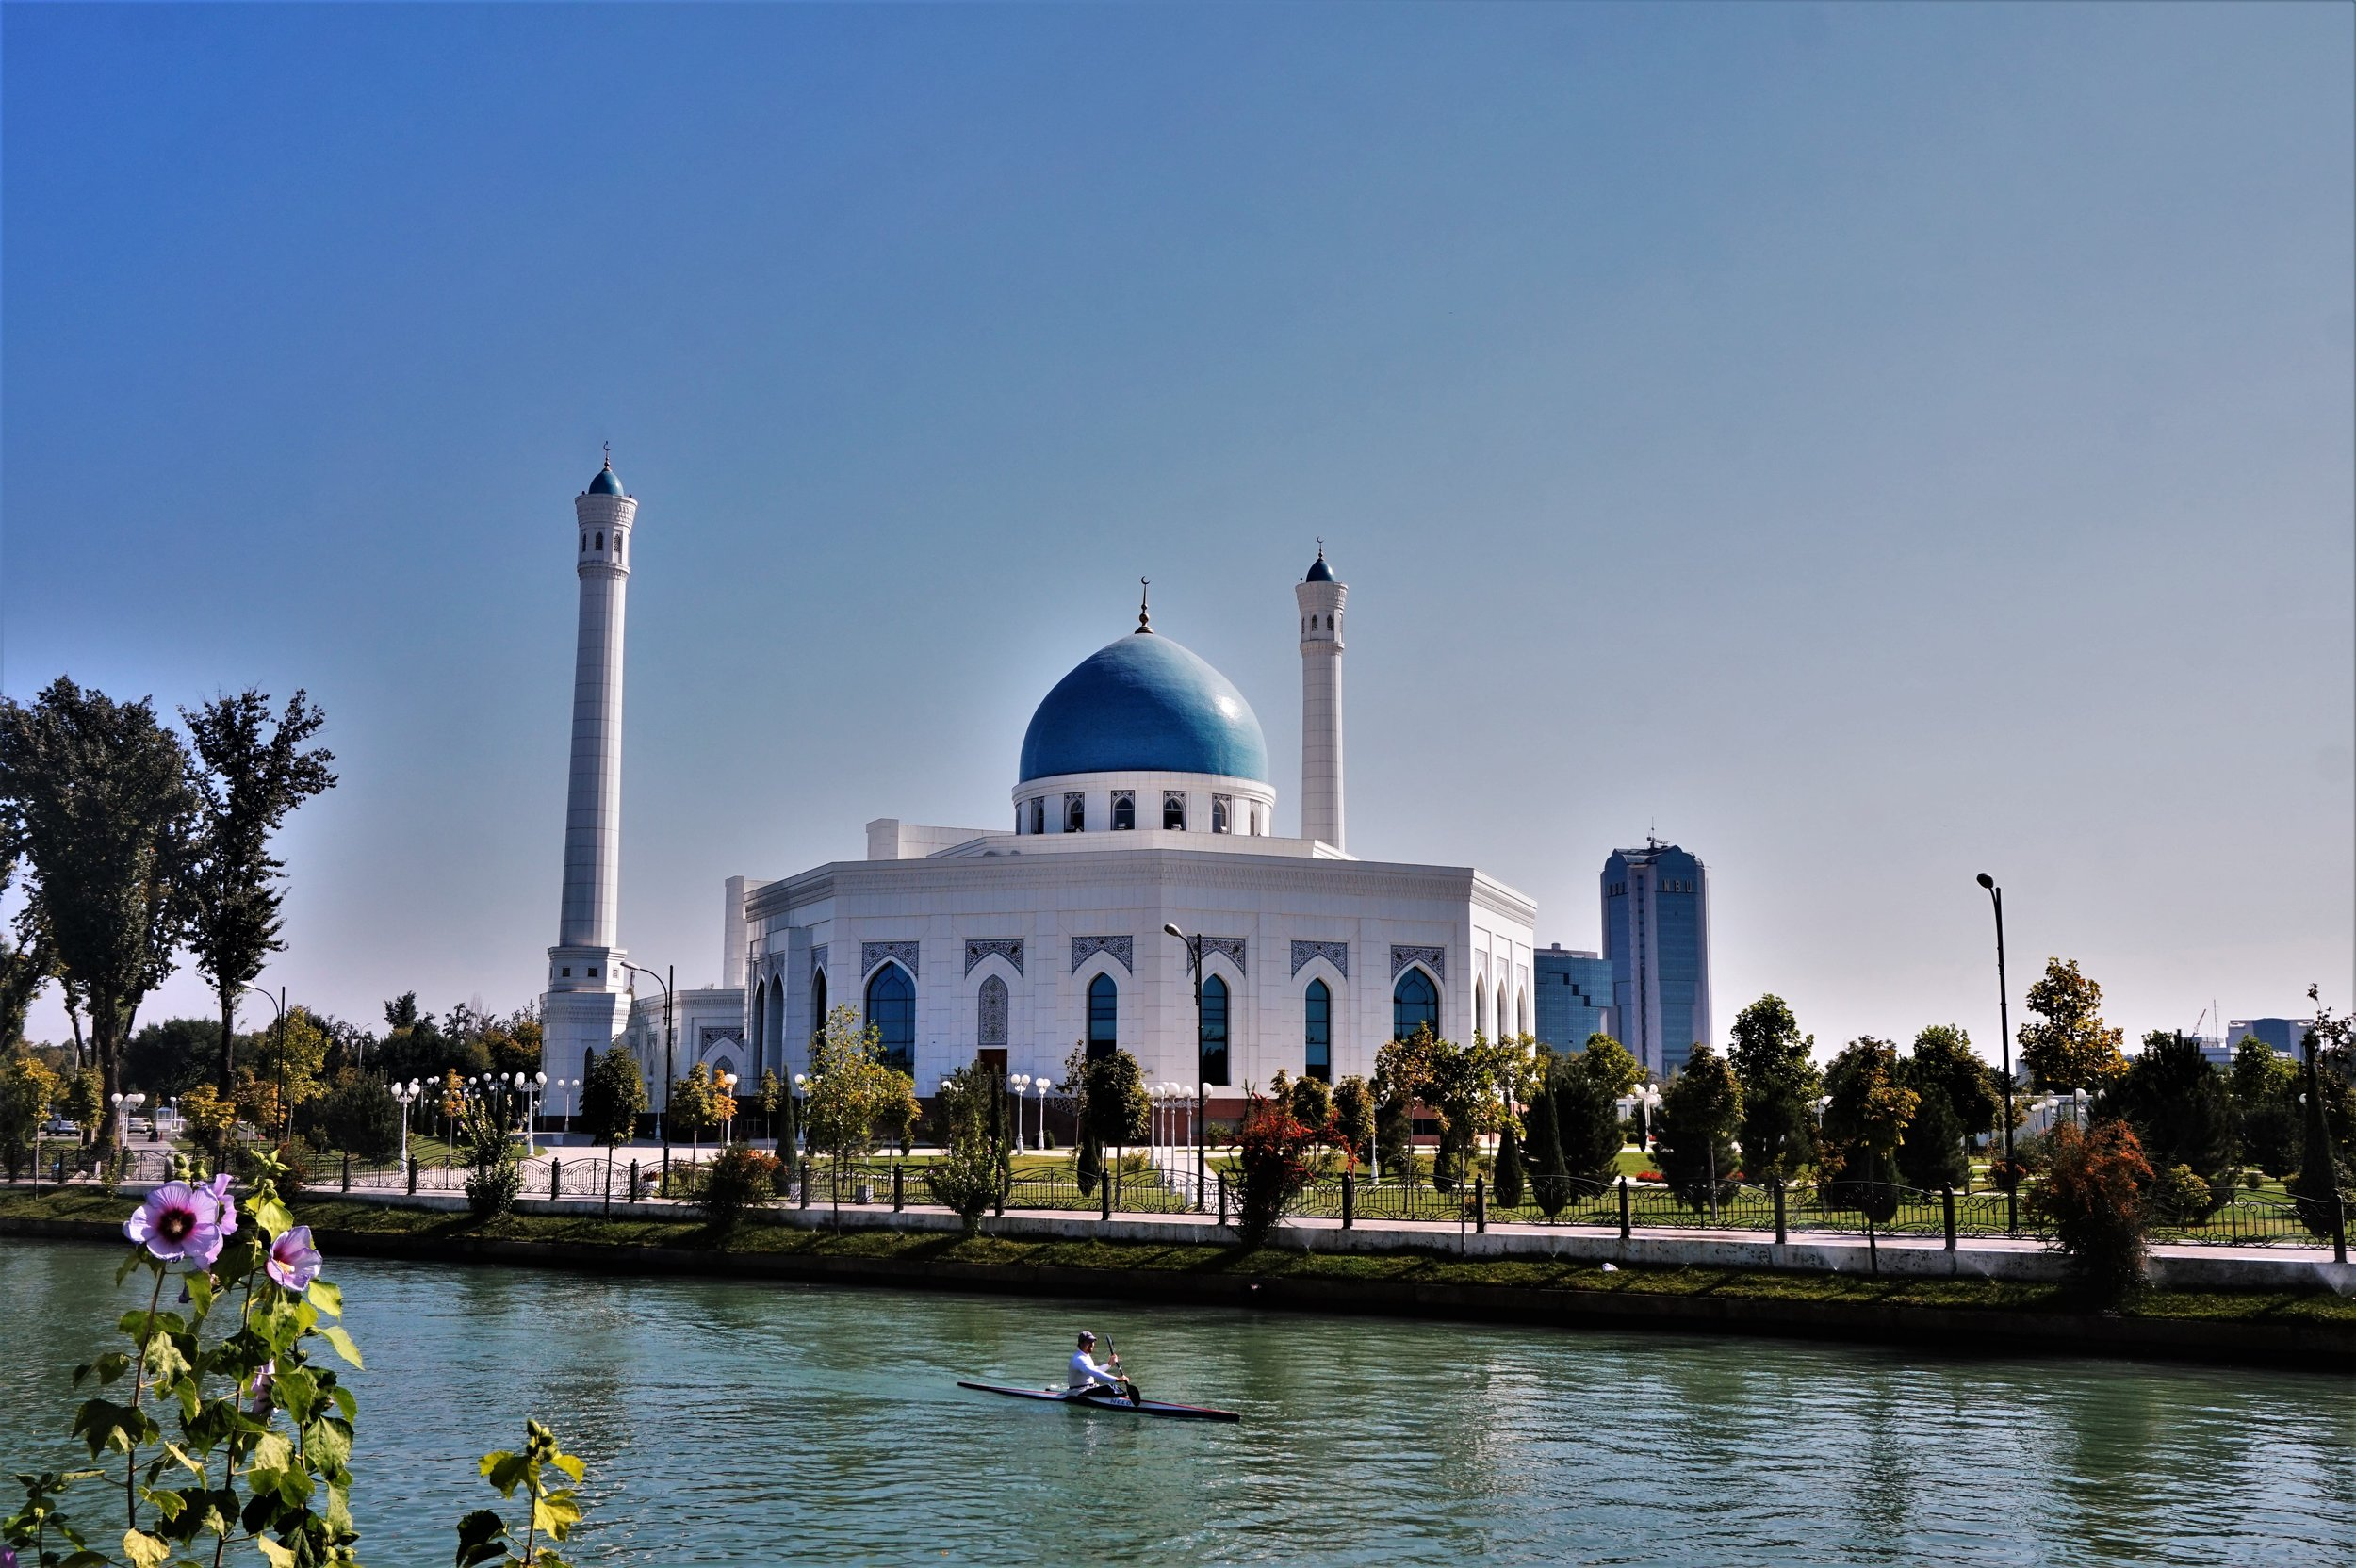 Go kayaking is one of the best things to do in Tashkent, Uzbekistan.